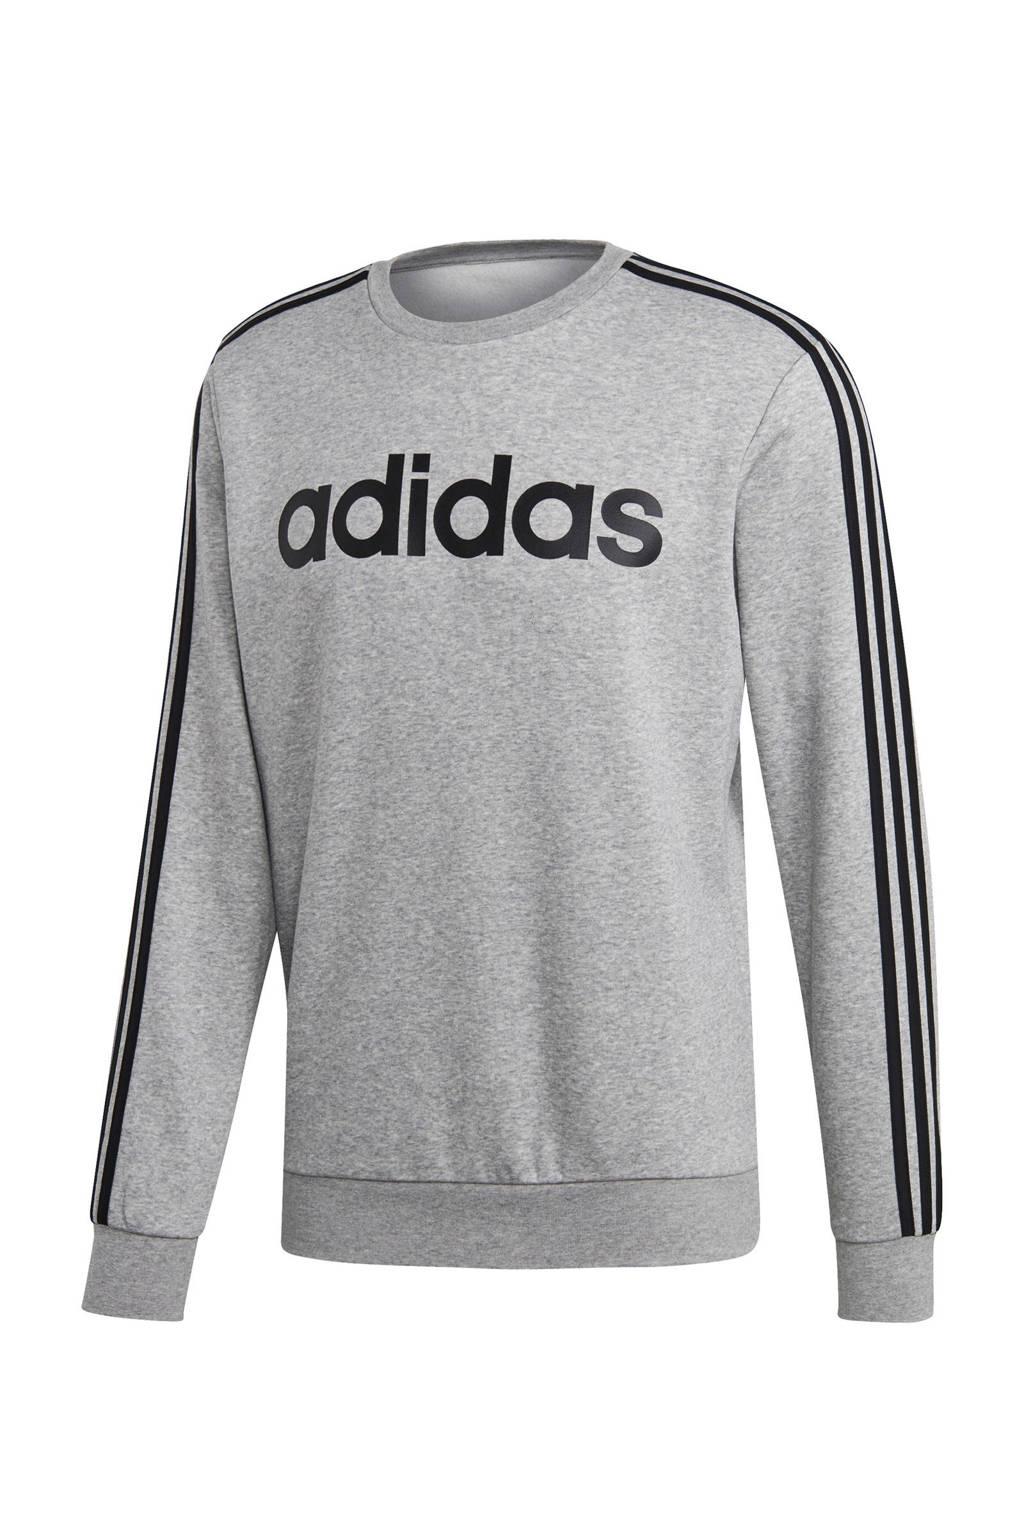 adidas performance   sportsweater grijs/zwart, Grijs melange/zwart